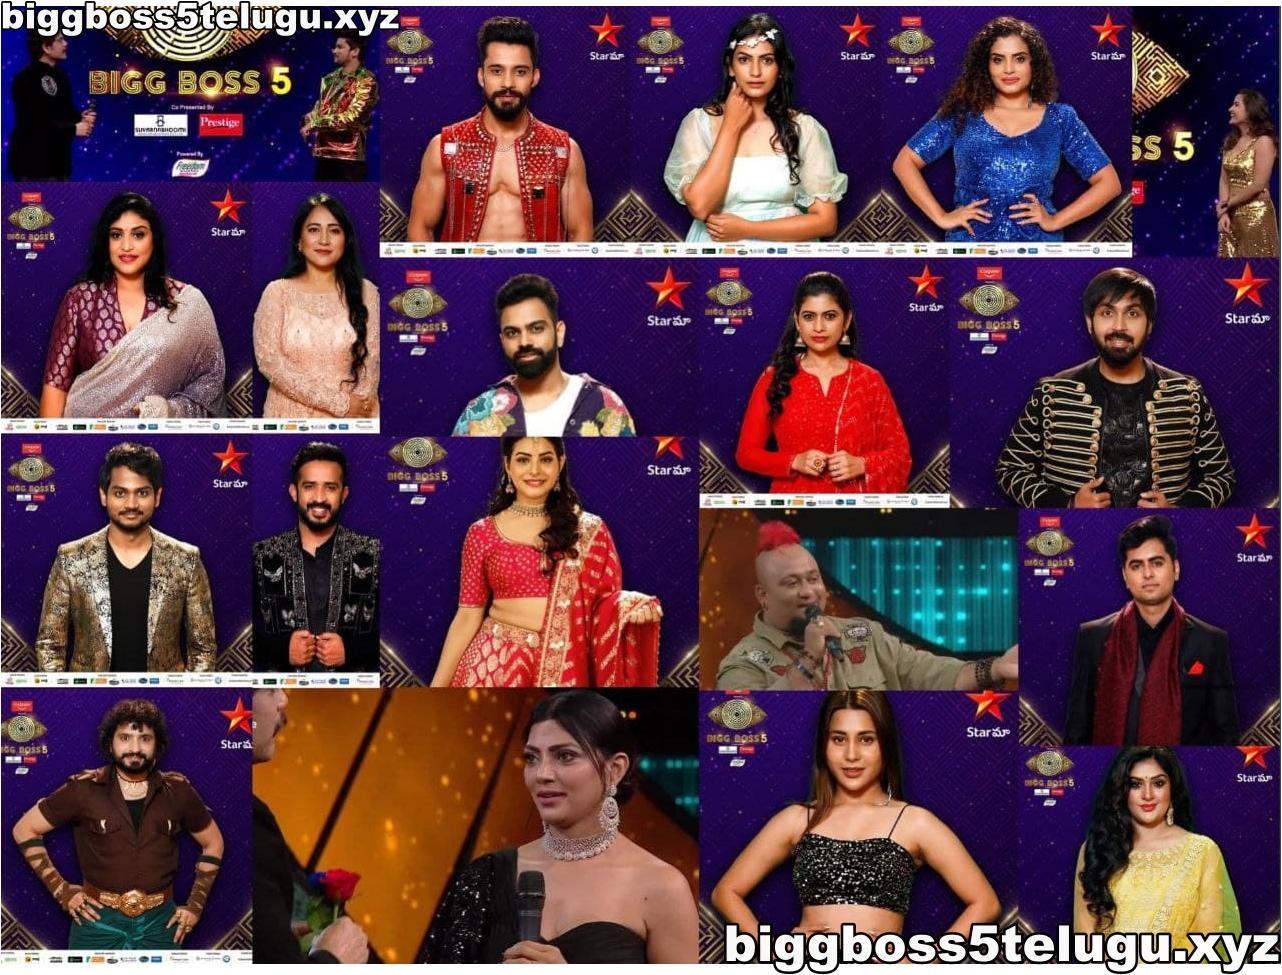 Bigg boss 5 telugu 19 contestants